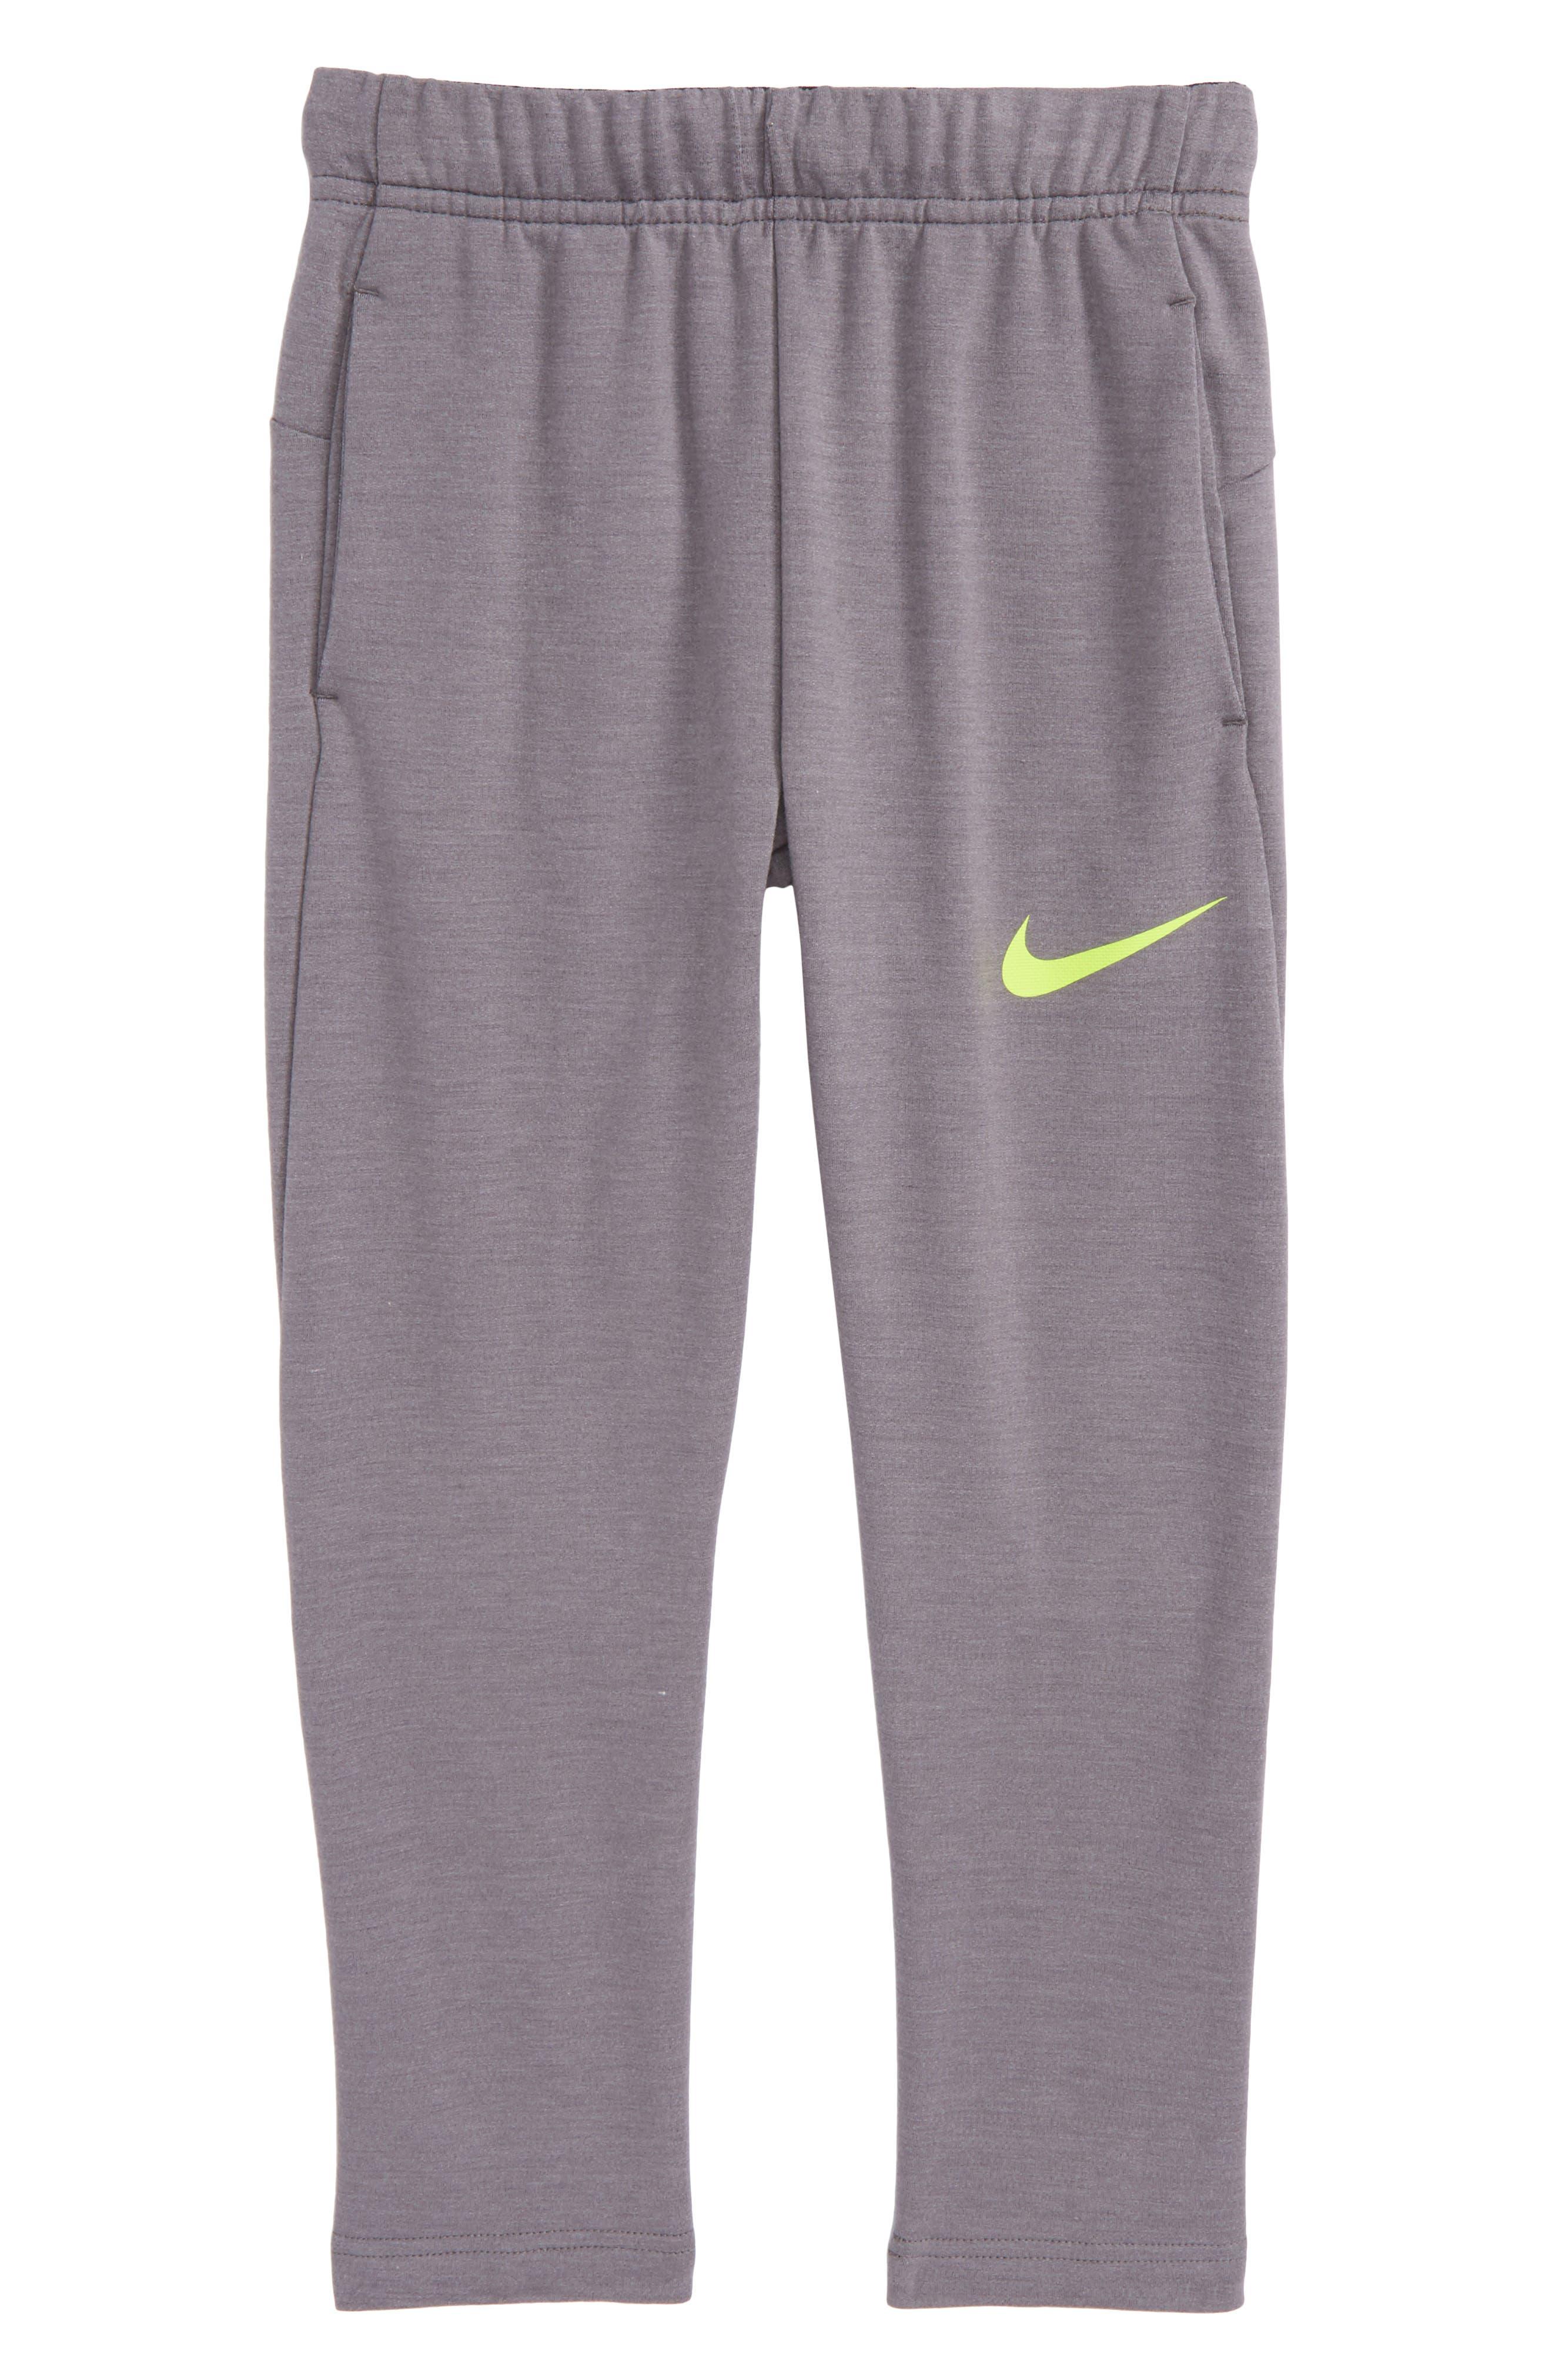 Dry Training Sweatpants,                         Main,                         color, Gunsmoke Heather